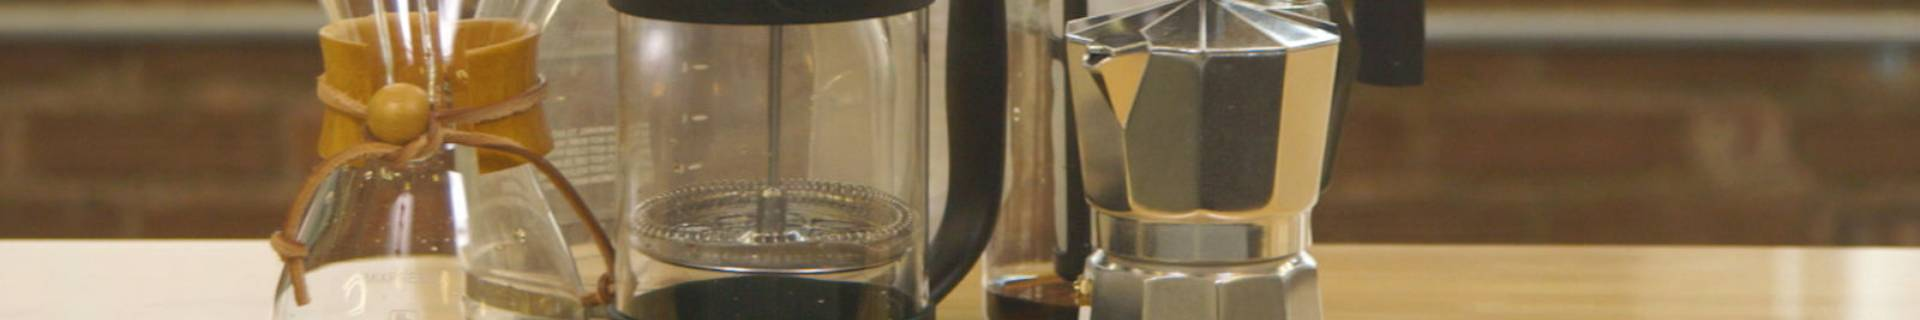 Coffee Accesories - ECOLECTIA